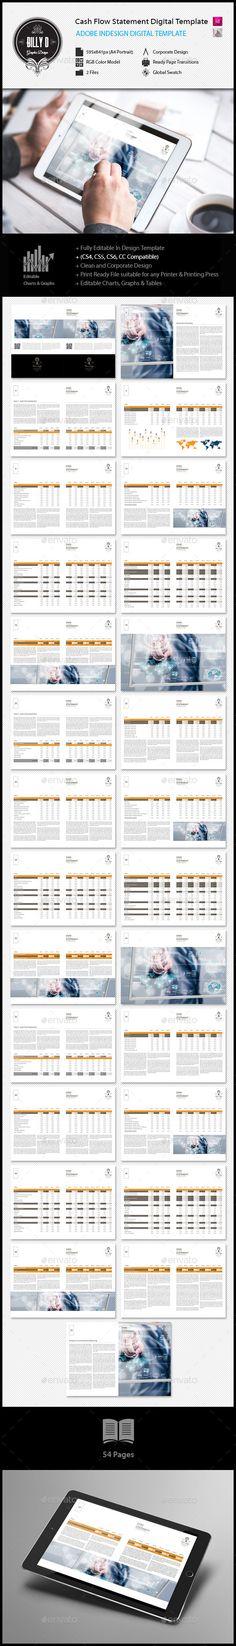 Cash Flow Statement Digital Template Adobe indesign, Cash flow - cash flow statement